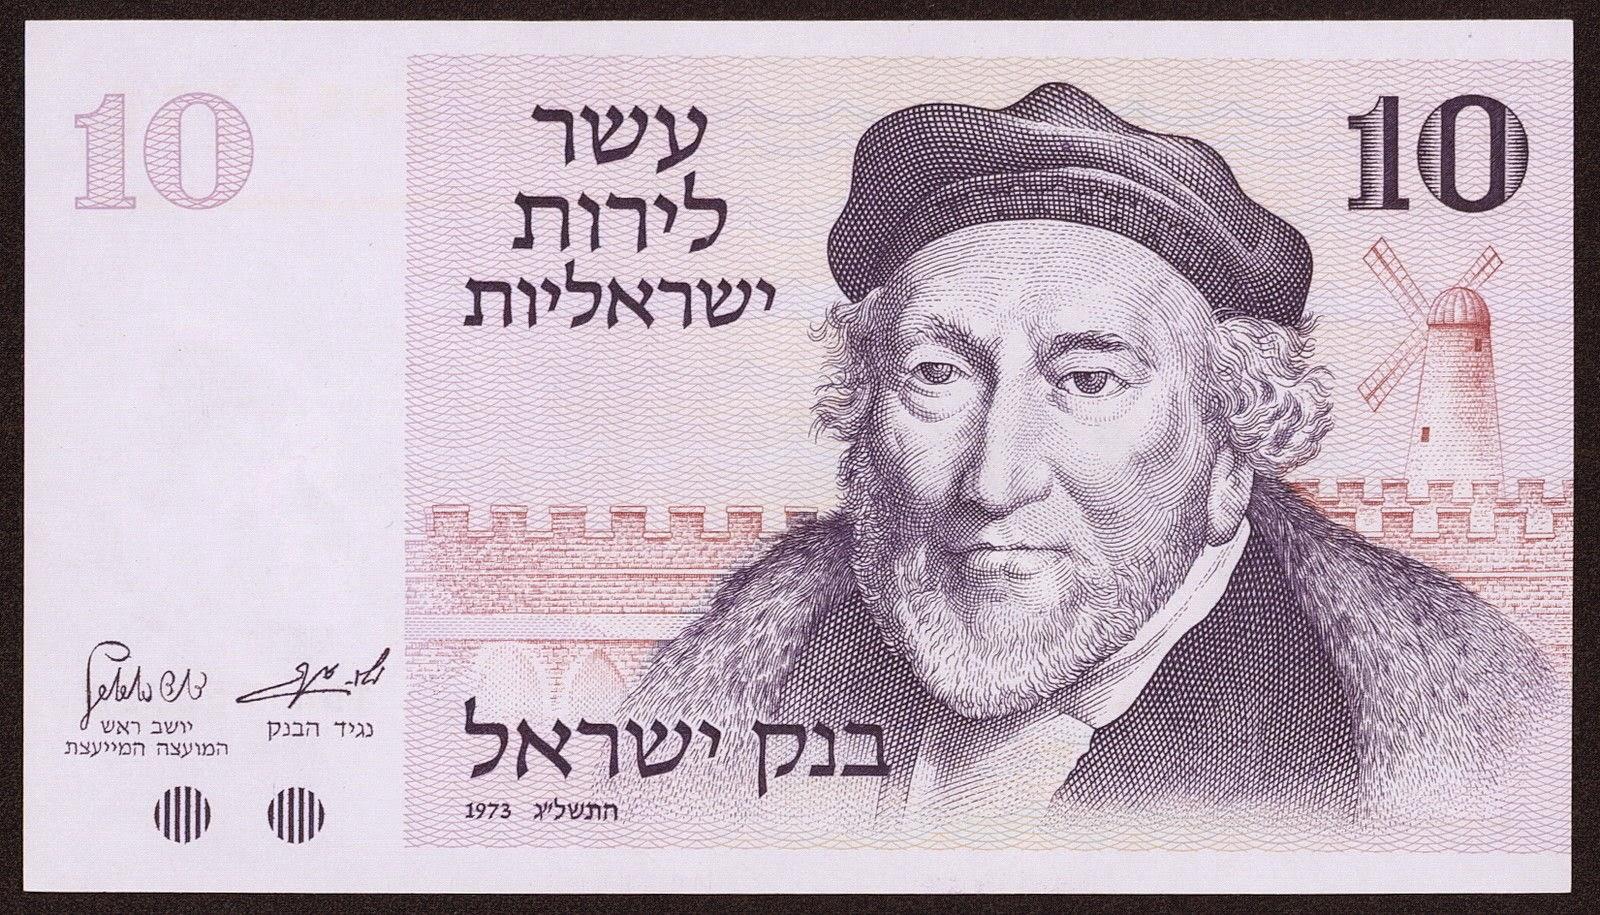 Israel currency notes 10 Lirot banknote 1973 Moshe Montefiori